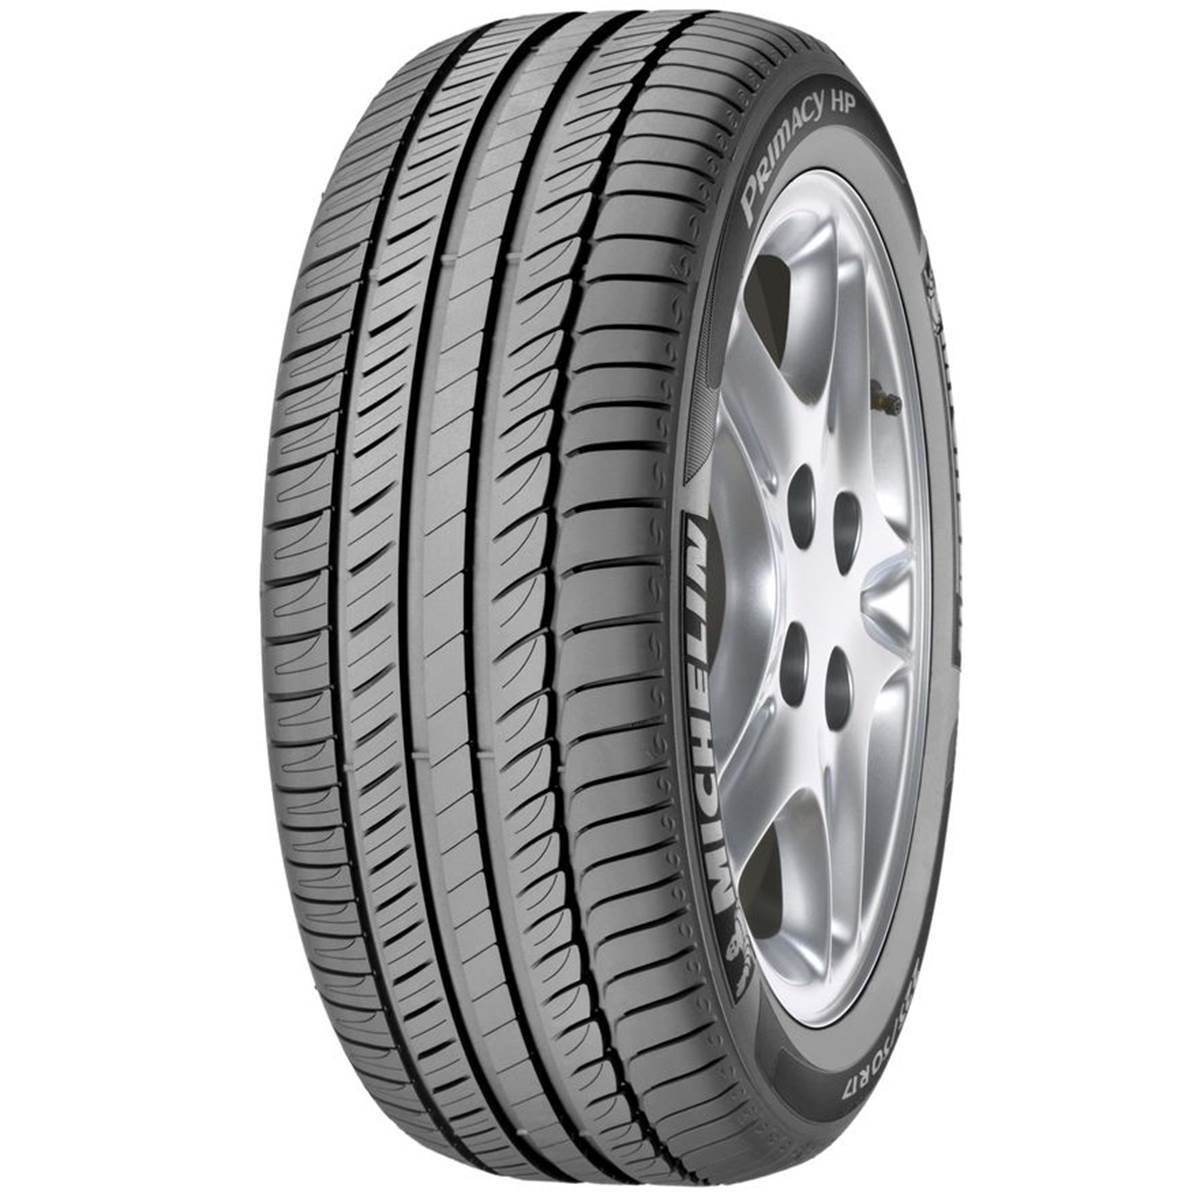 Pneu Michelin 225/50R17 94W Primacy Hp